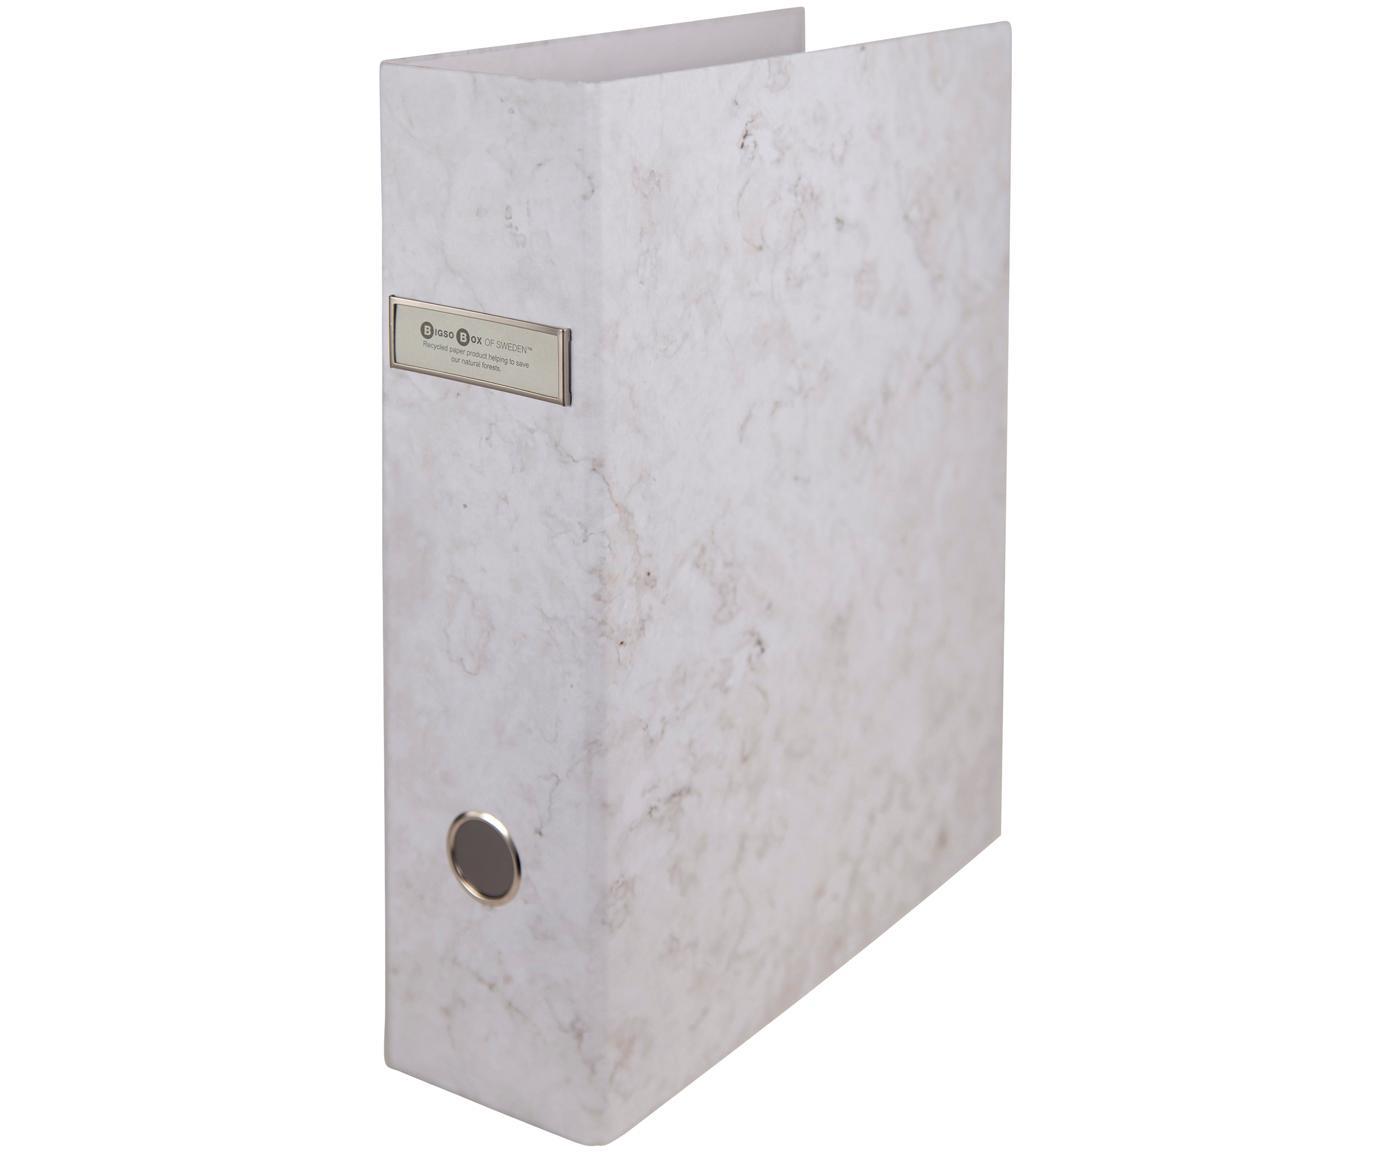 Documentenmappen Archie, 2stuks, Wit, gemarmerd, 29 x 32 cm